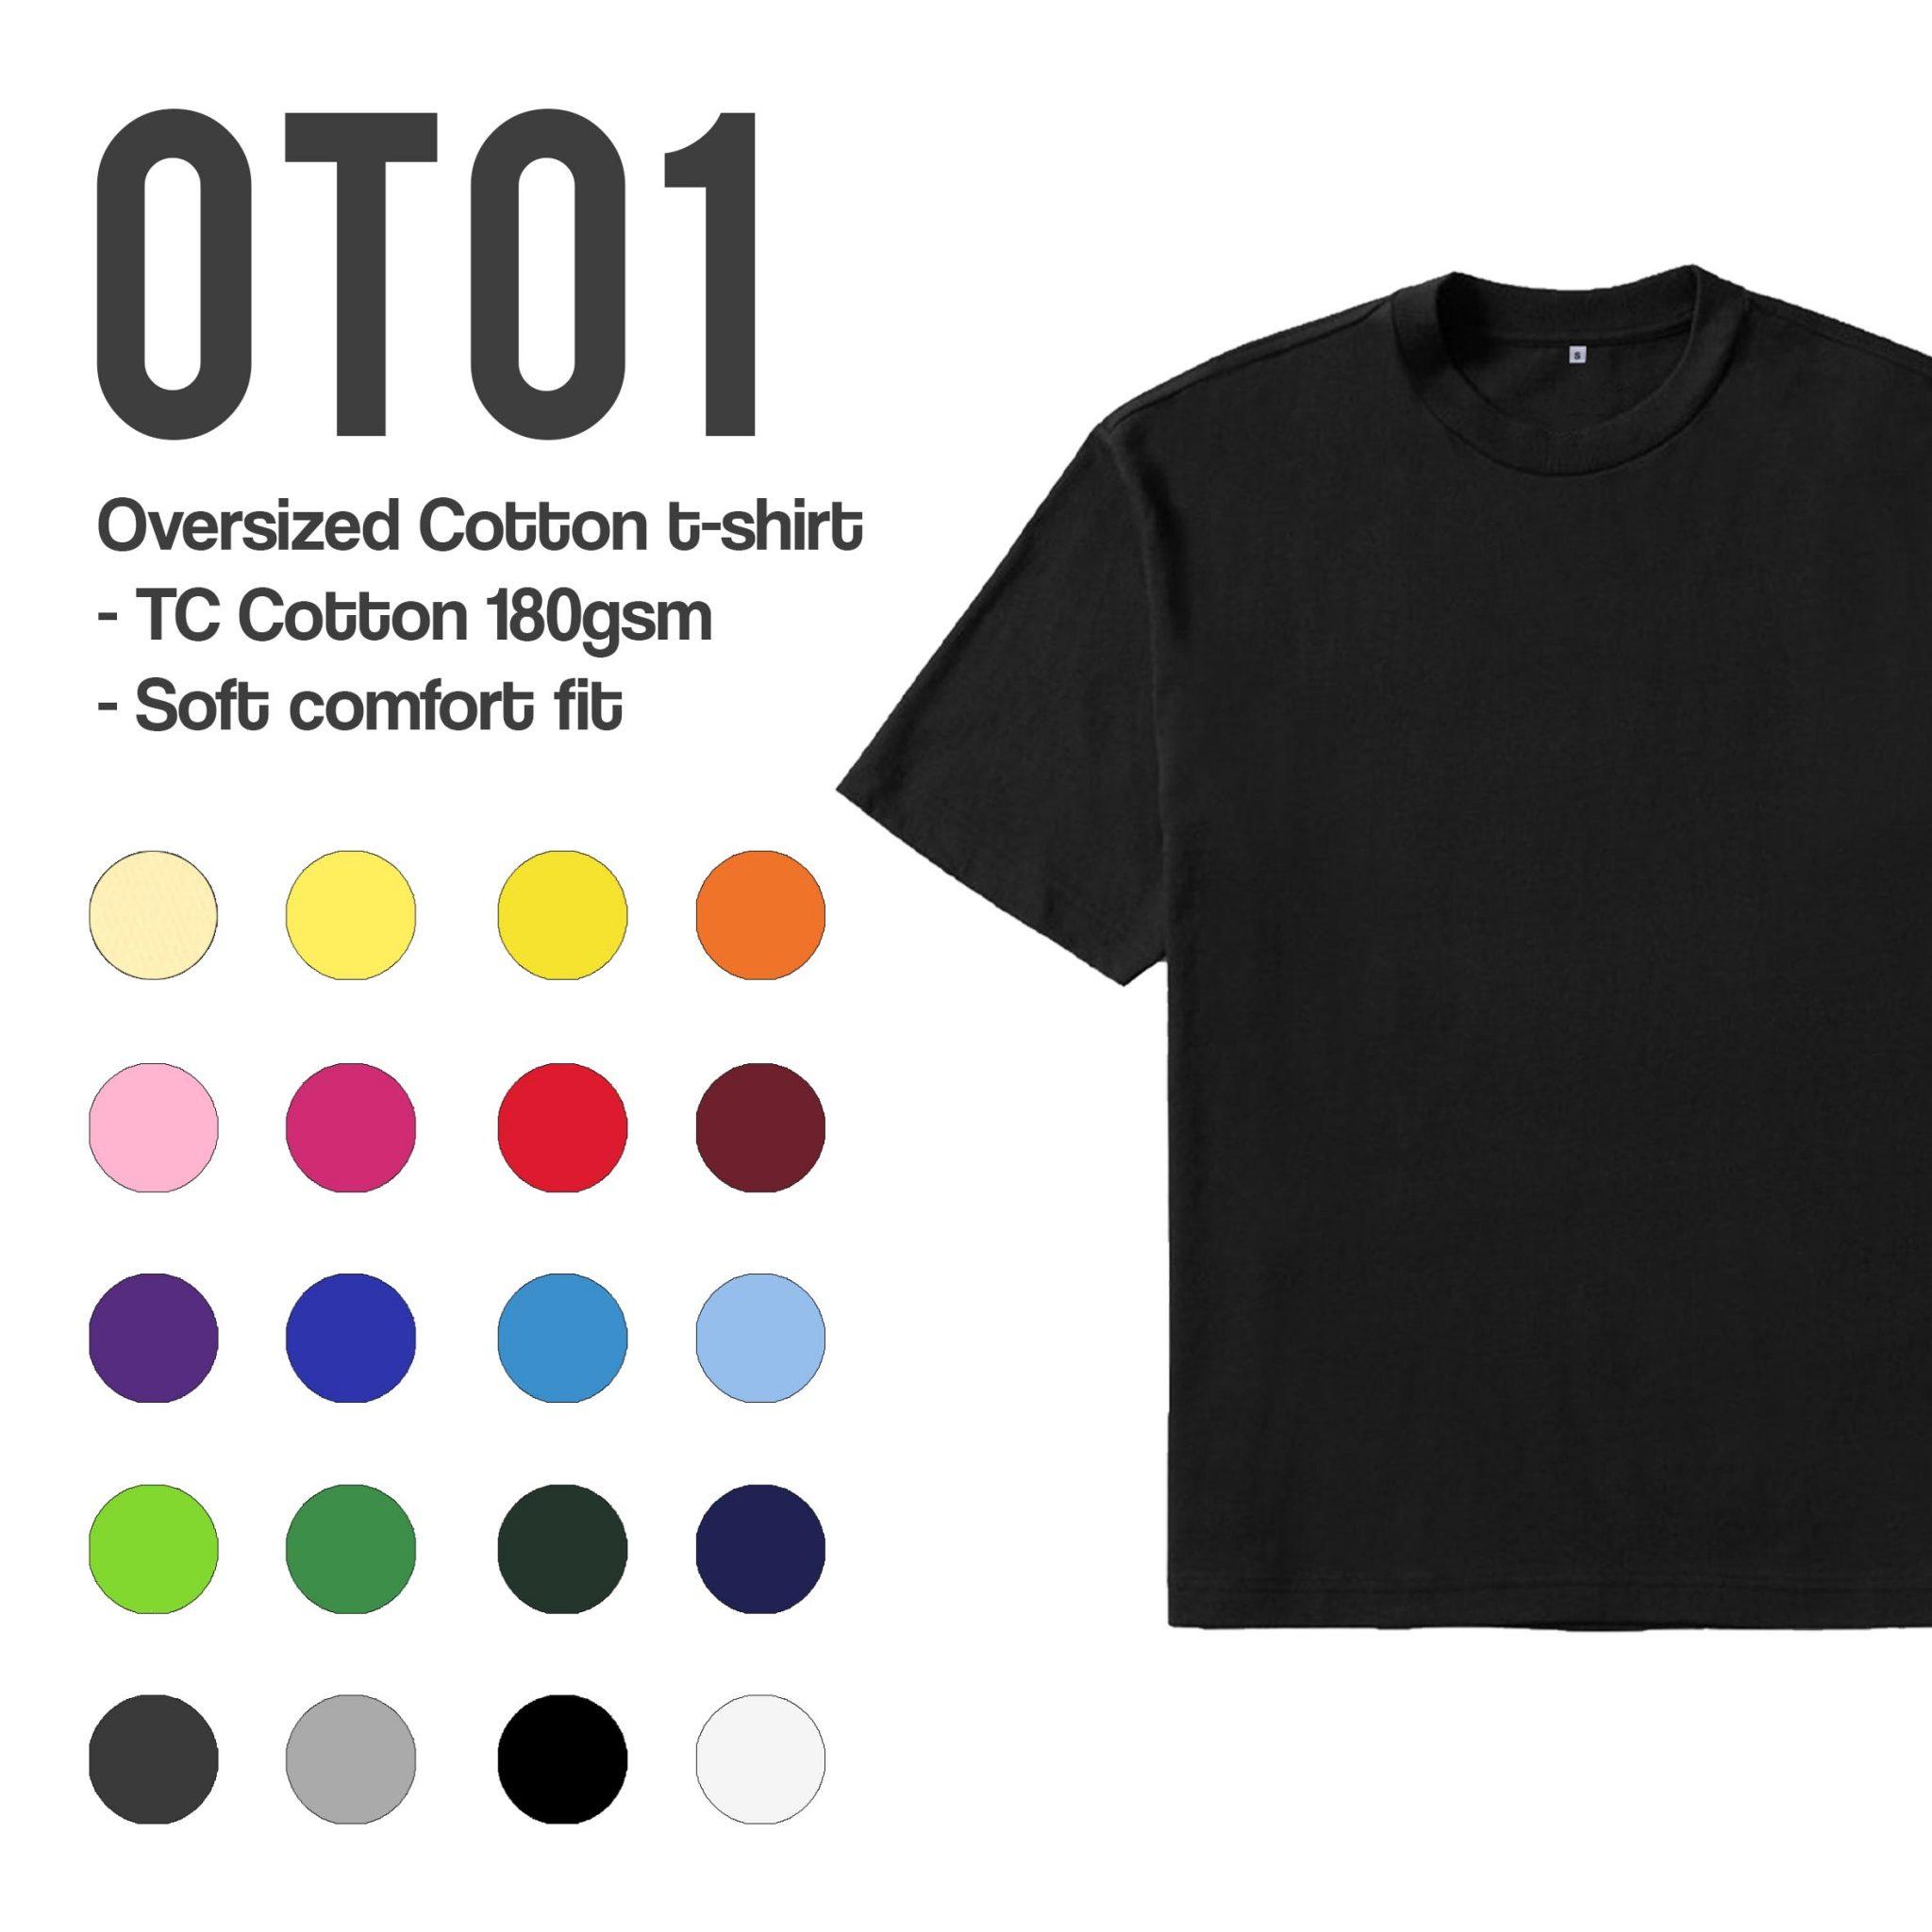 OT01 oversized t-shirt